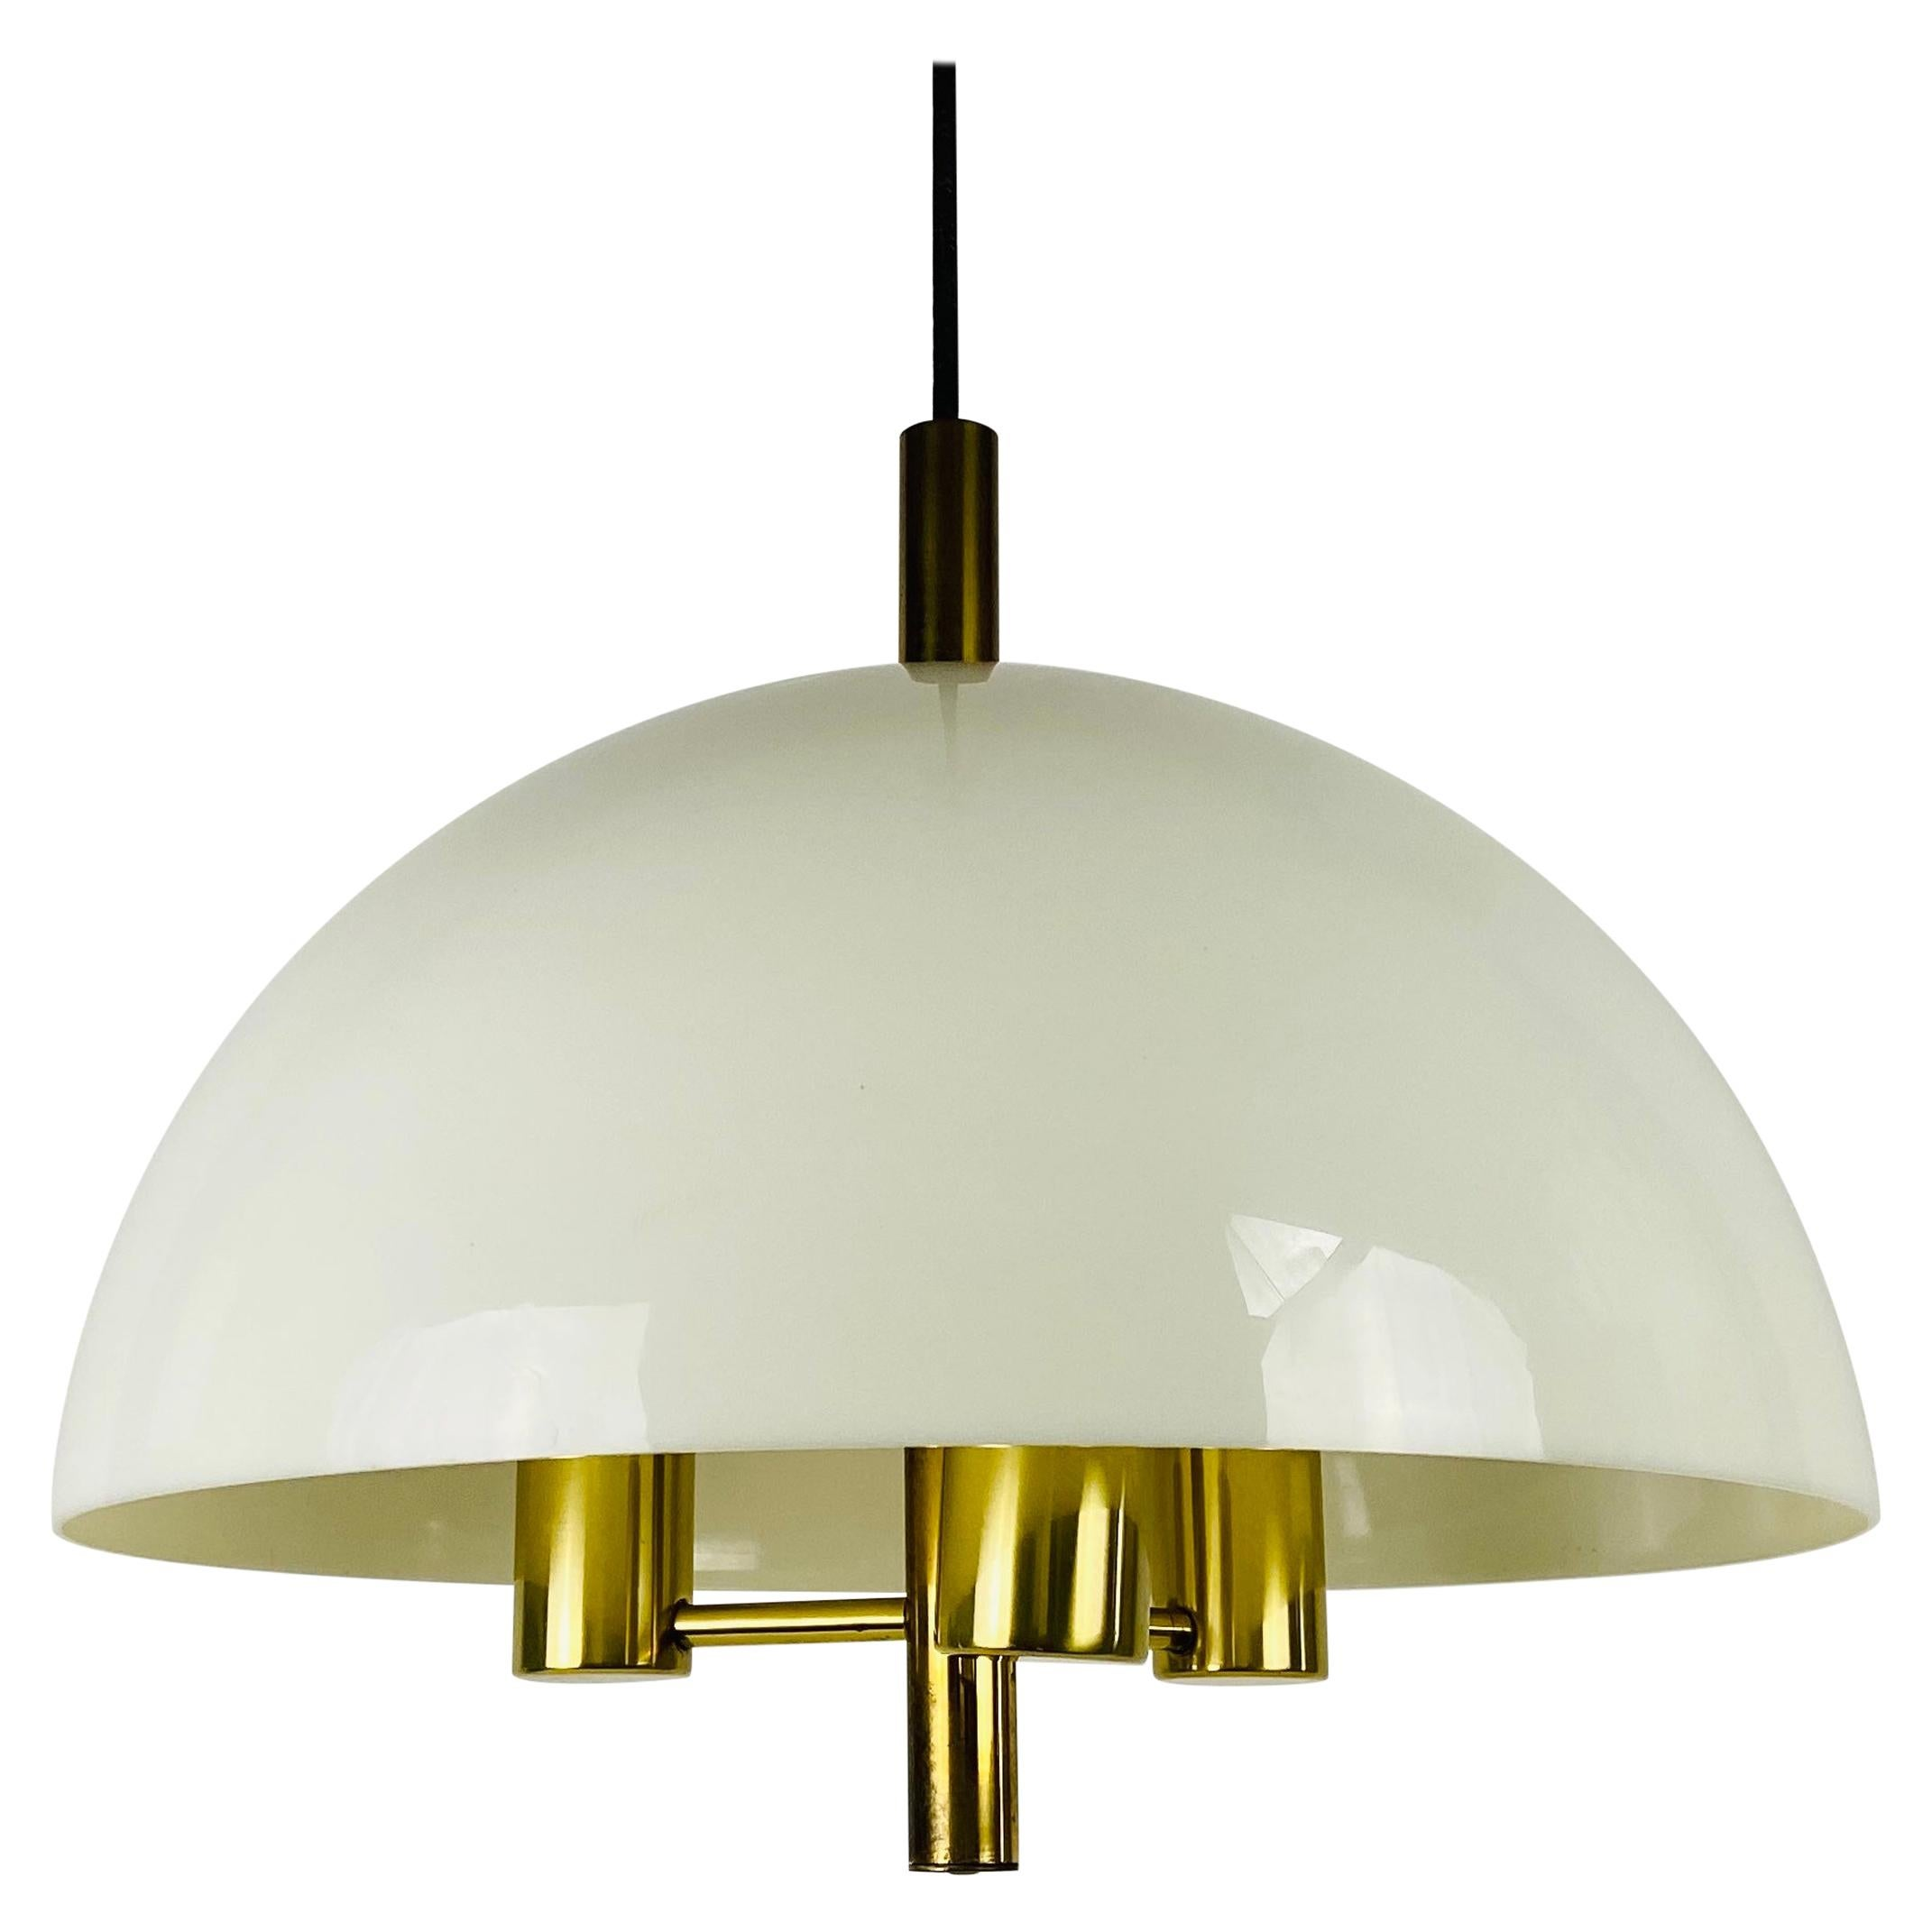 Midcentury Plexiglass Pendant Lamp, 1960s